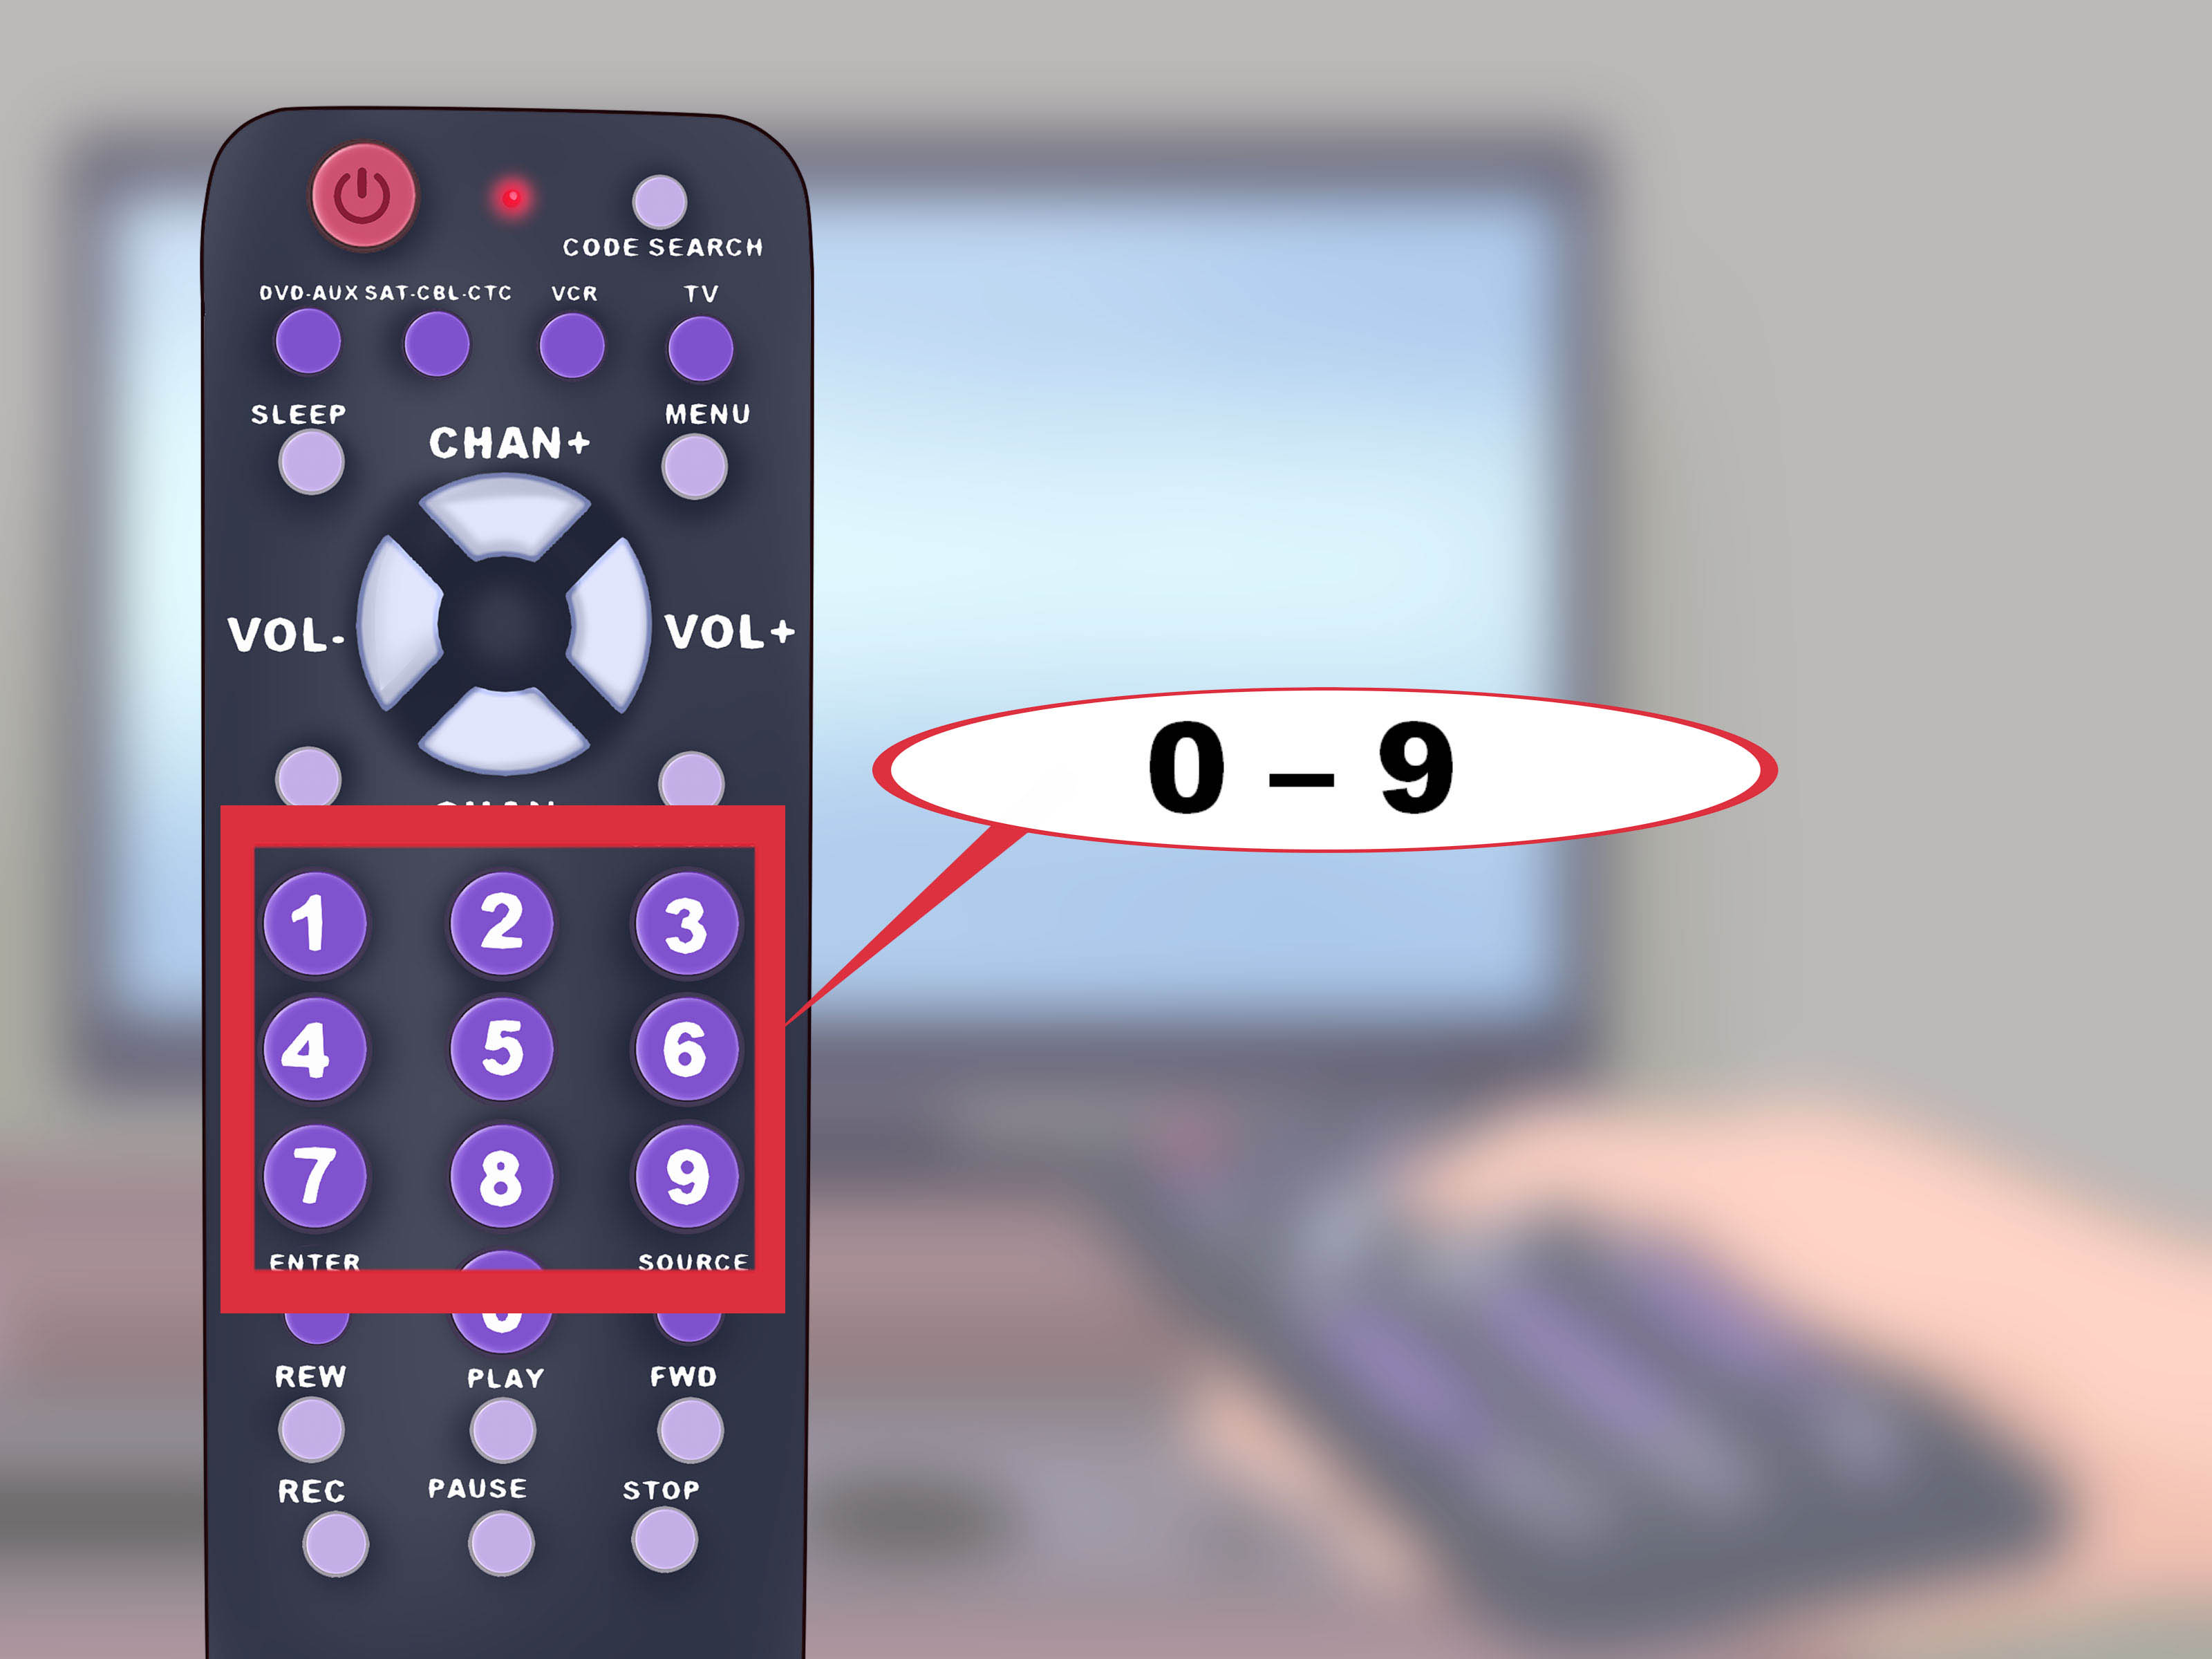 sharp roku tv model lc-50lb481u led board manual